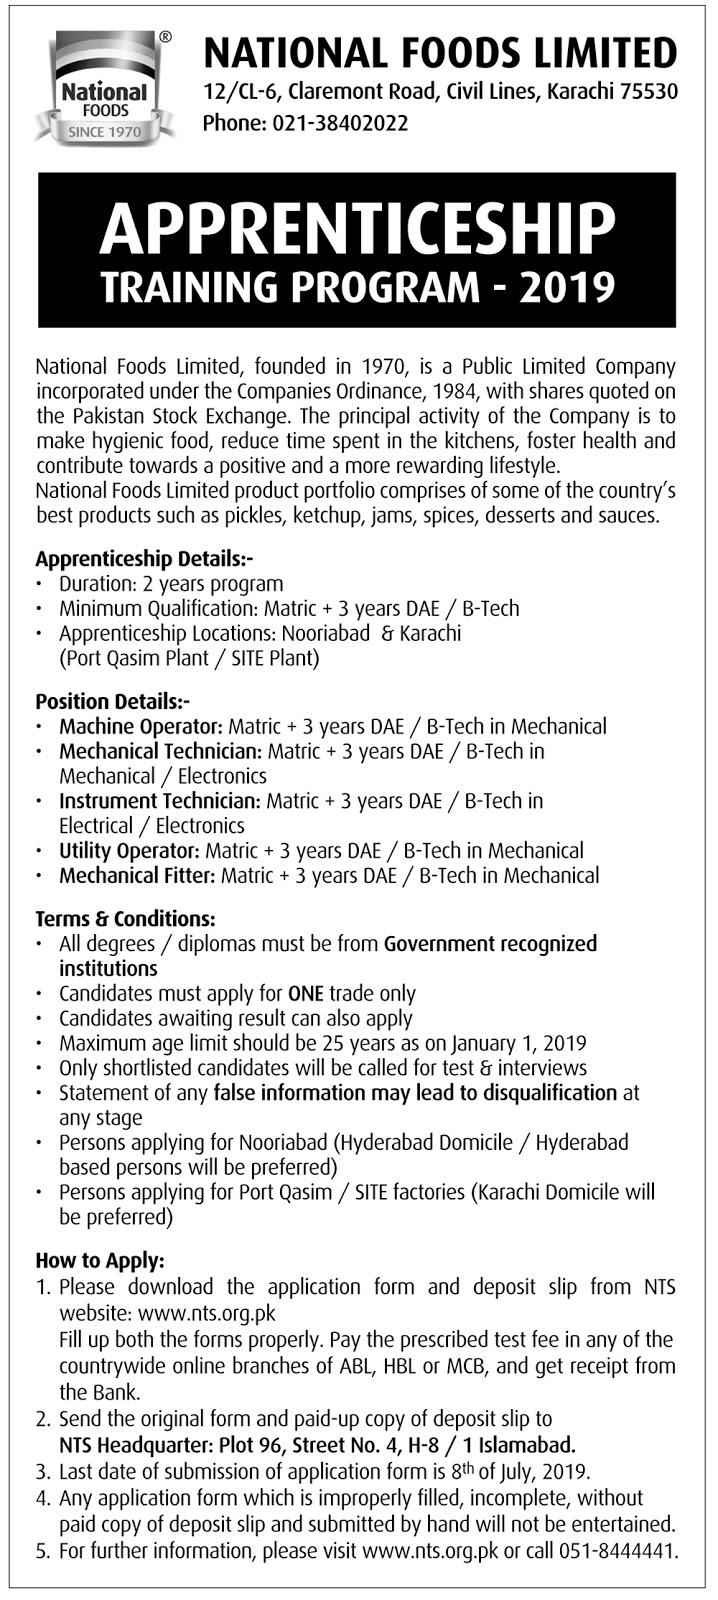 National Foods Limited Karachi Apprenticeship Training Program June 2019